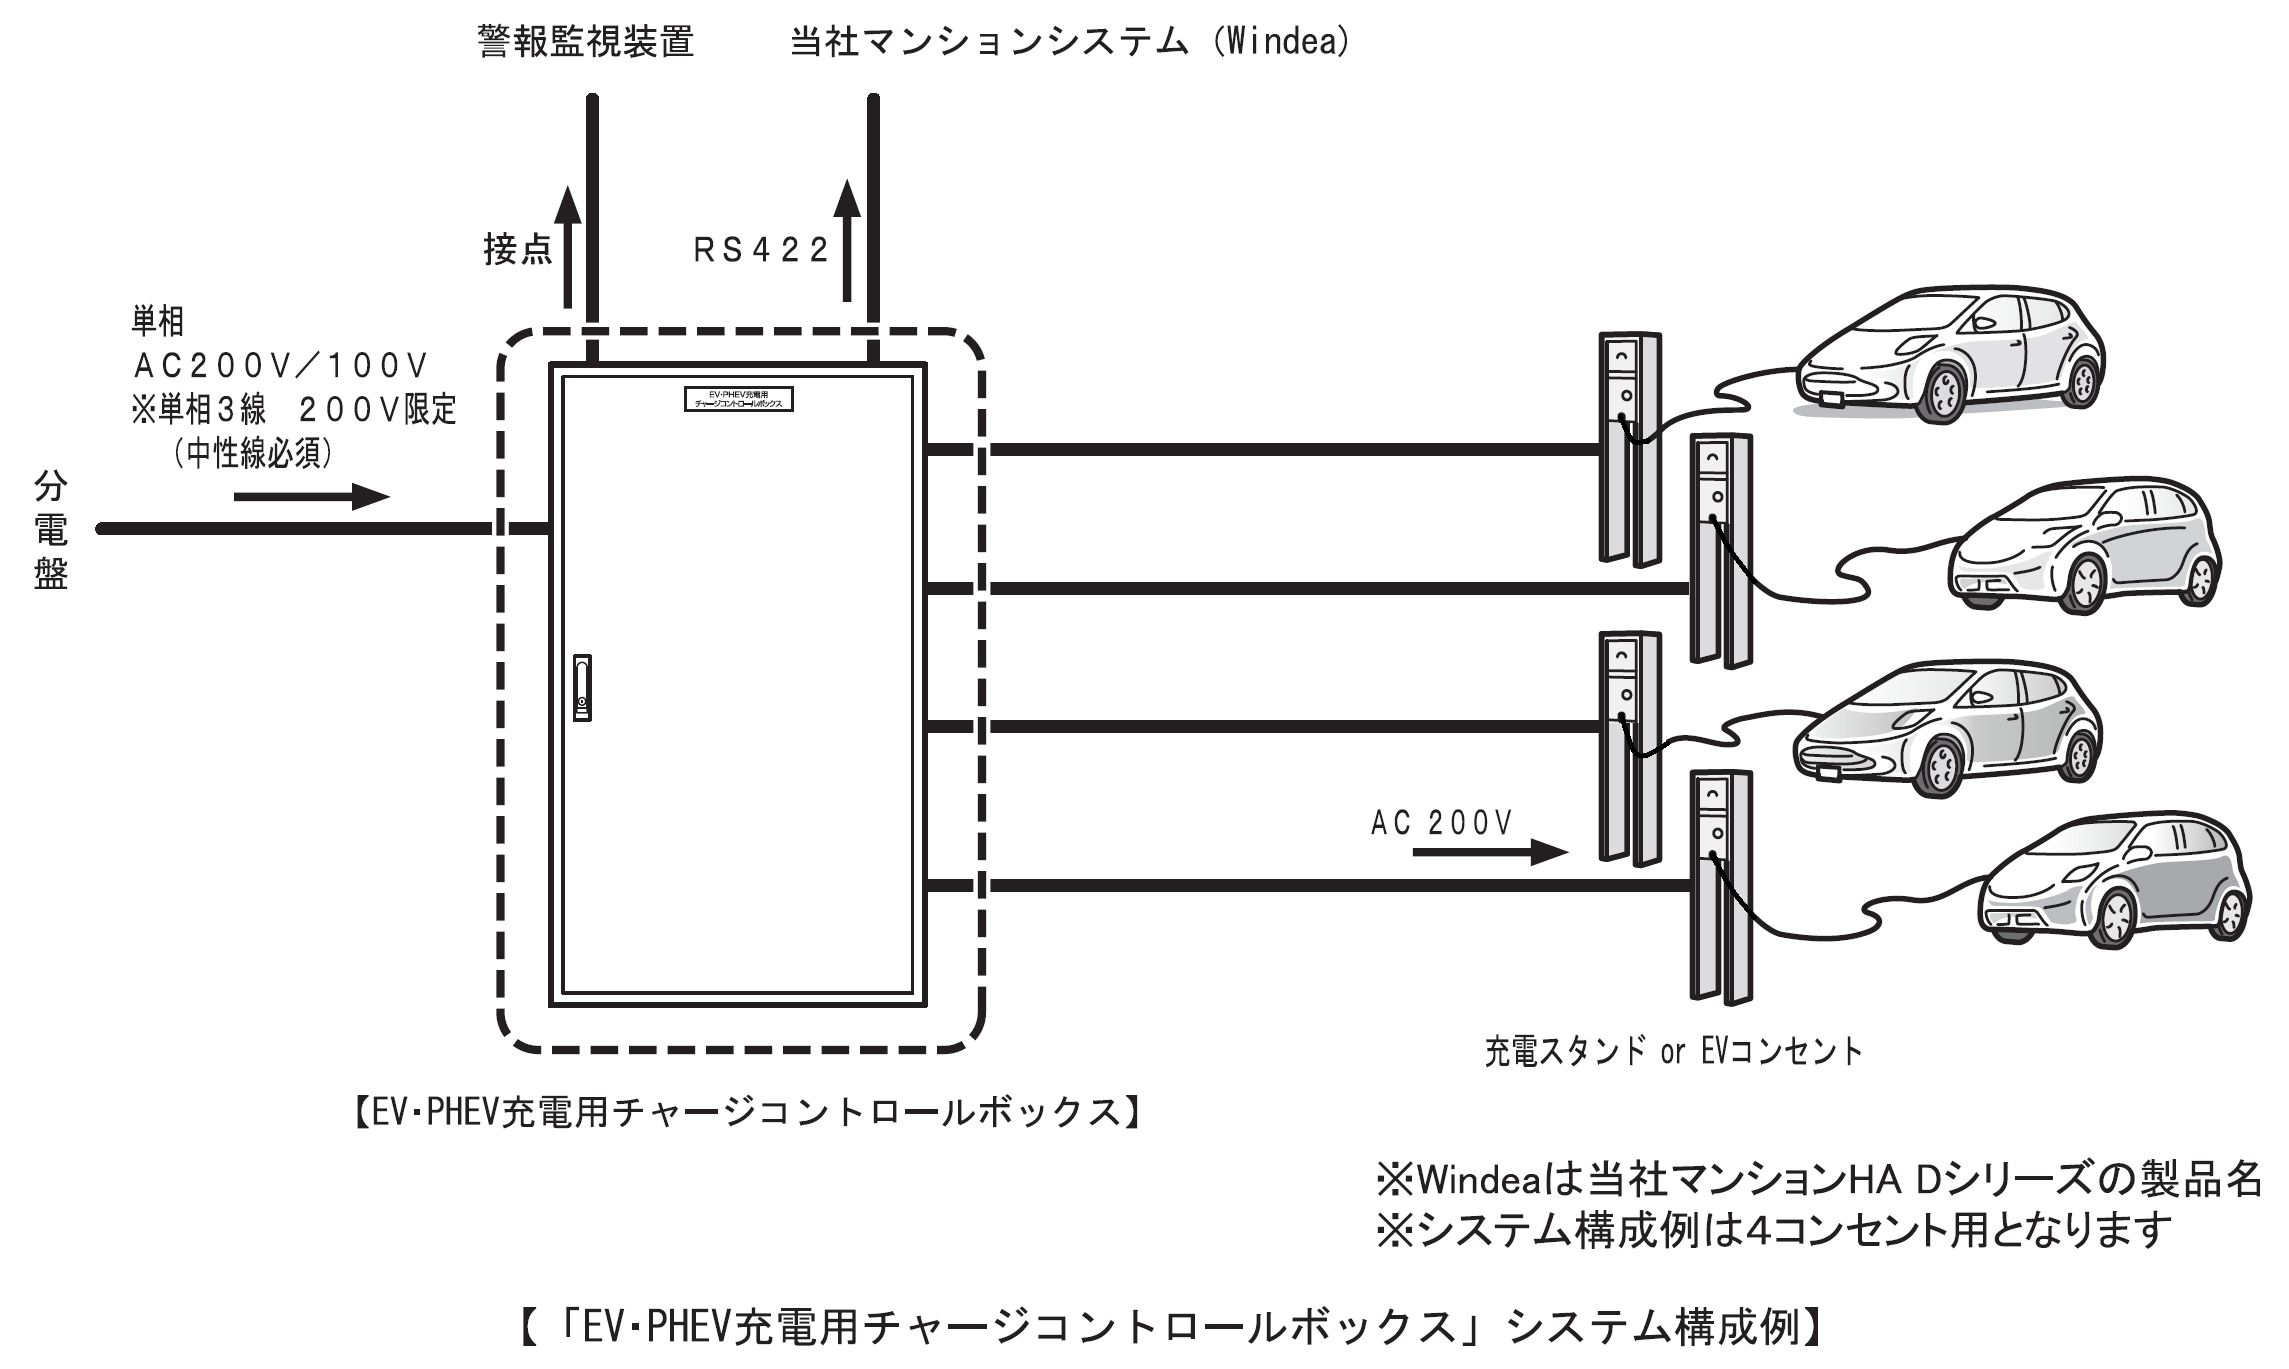 「EV・PHEV充電用チャージコントロールボックス」システム構成例